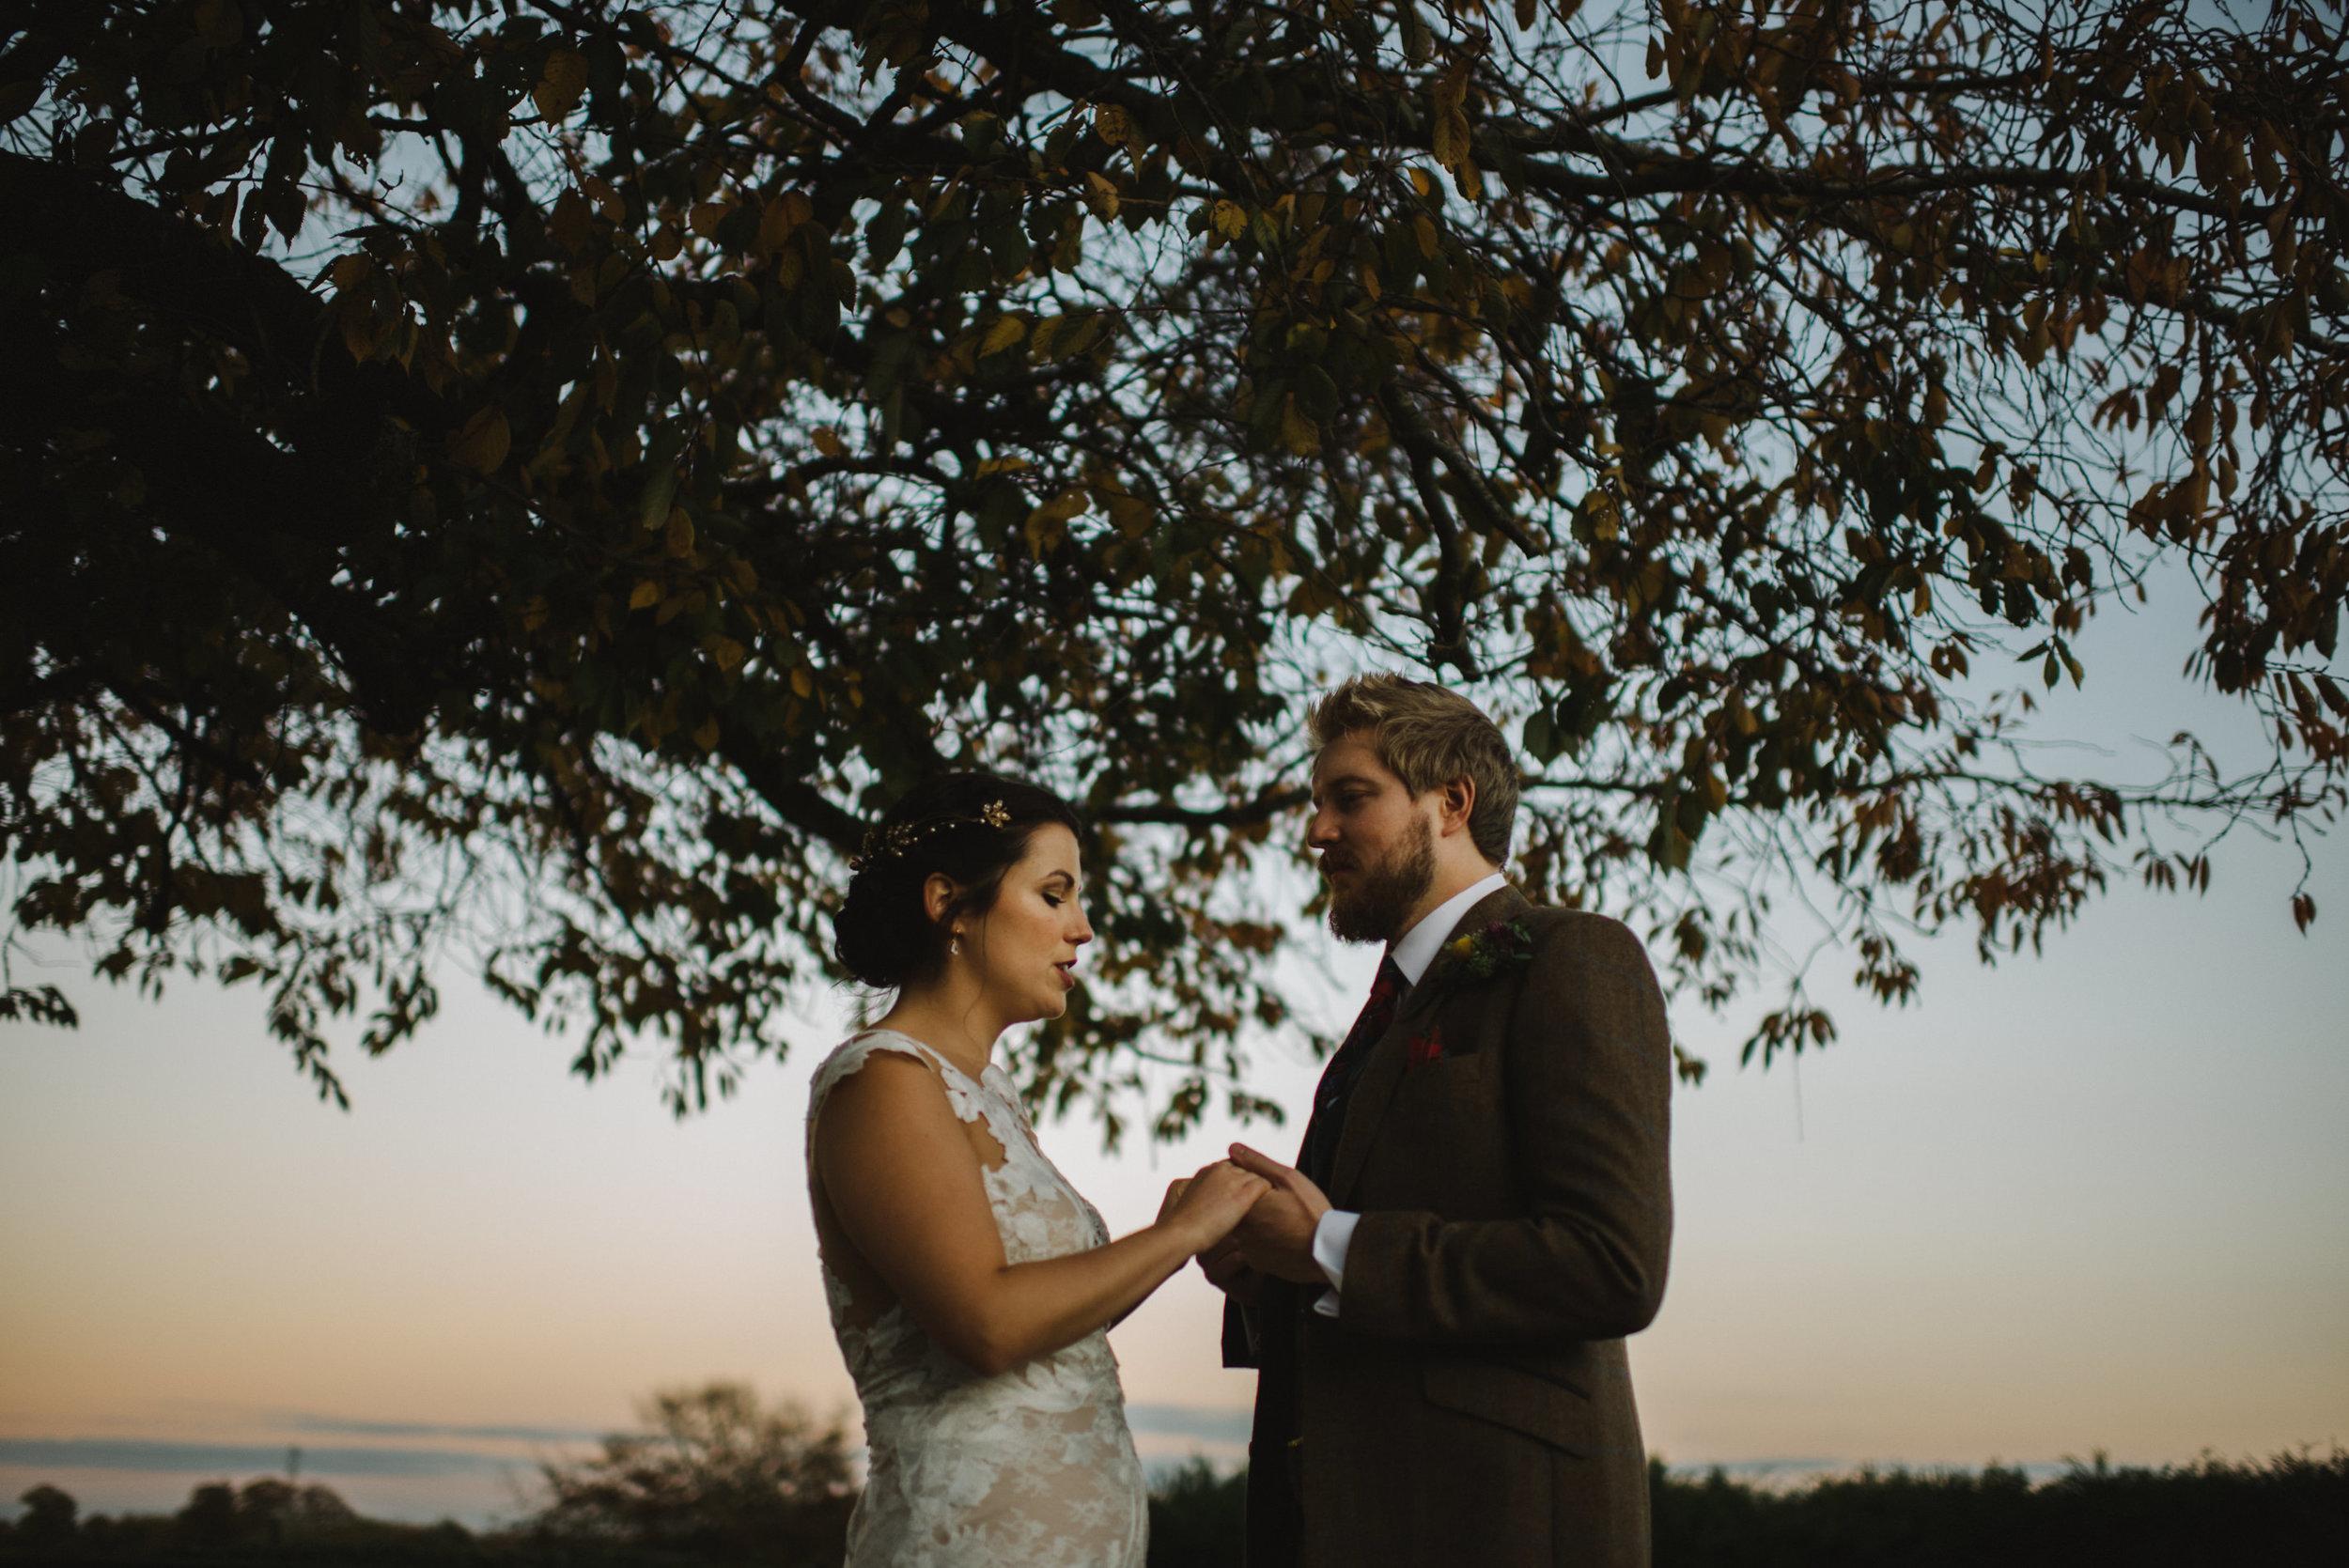 0150-LISA-DEVINE-PHOTOGRAPHY-ALTERNATIVE-WEDDING-PHOTOGRAPHY-SCOTLAND-DESTINATION-WEDDINGS-GLASGOW-WEDDINGS-COOL-WEDDINGS-STYLISH-WEDDINGS.JPG